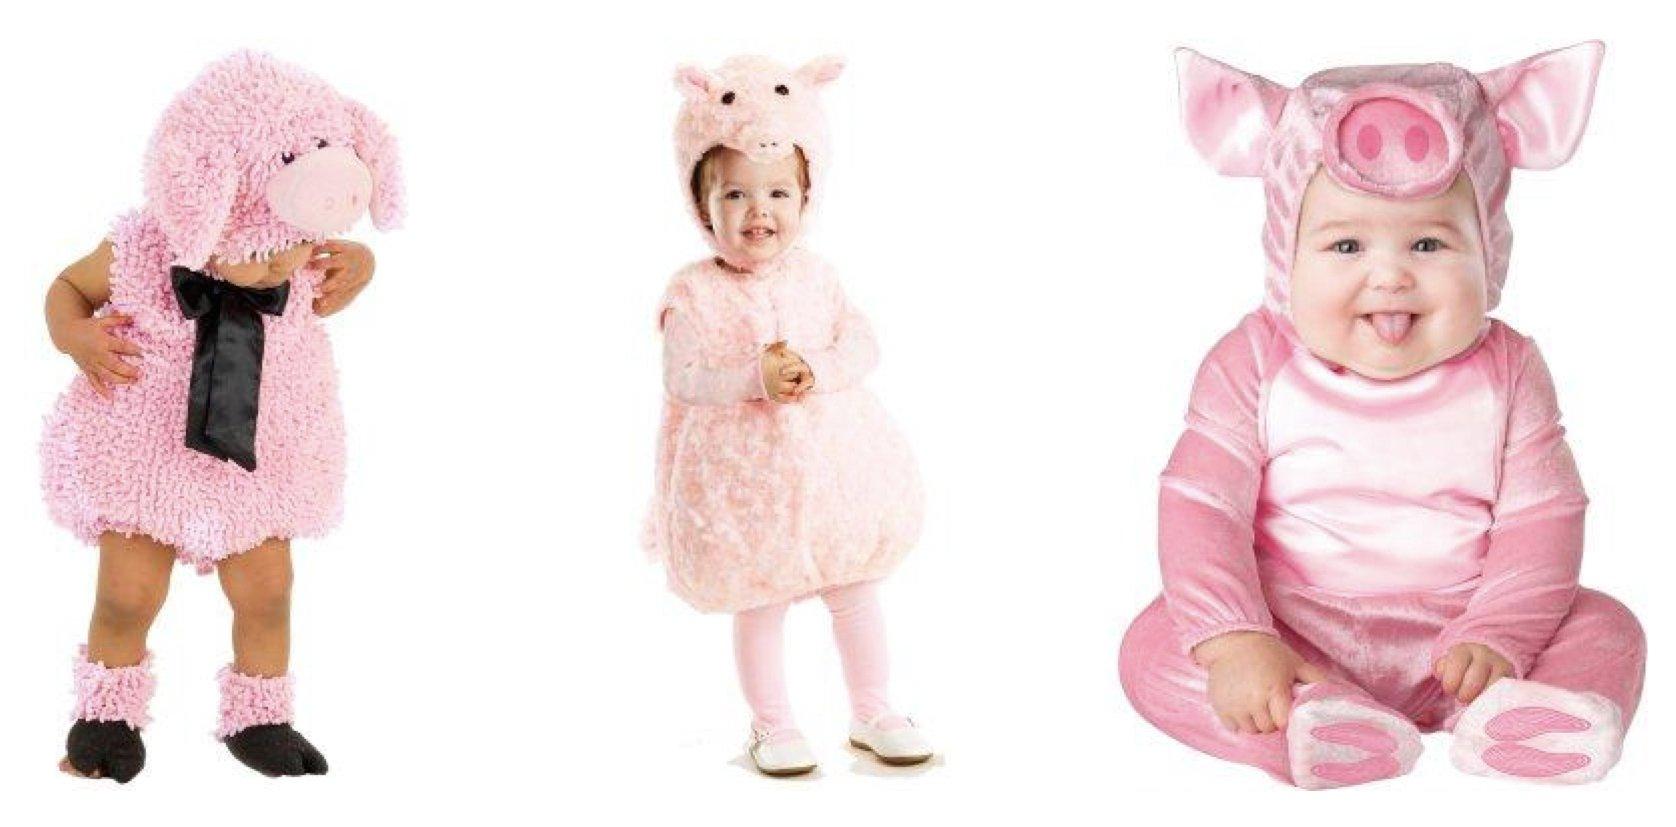 Peppa Pig Birthday Party Planning Ideas Supplies